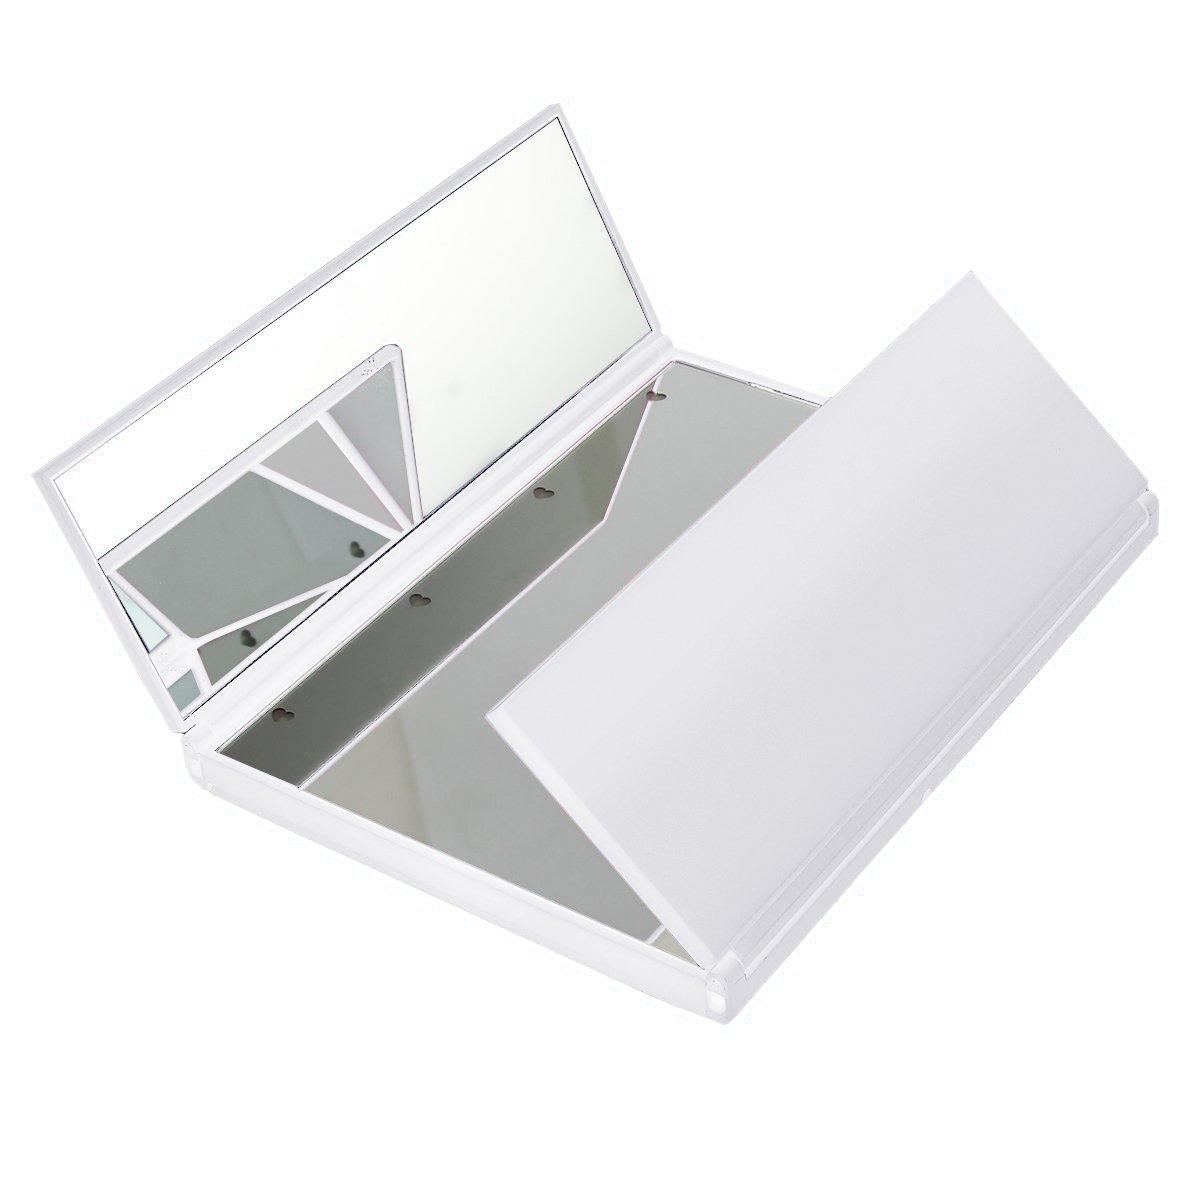 HOMPO Foldable 8 LED Light Illuminated Make Up Cosmetic Tabletop Beauty Compact Pocket Travel Vanity Mirror (Black)